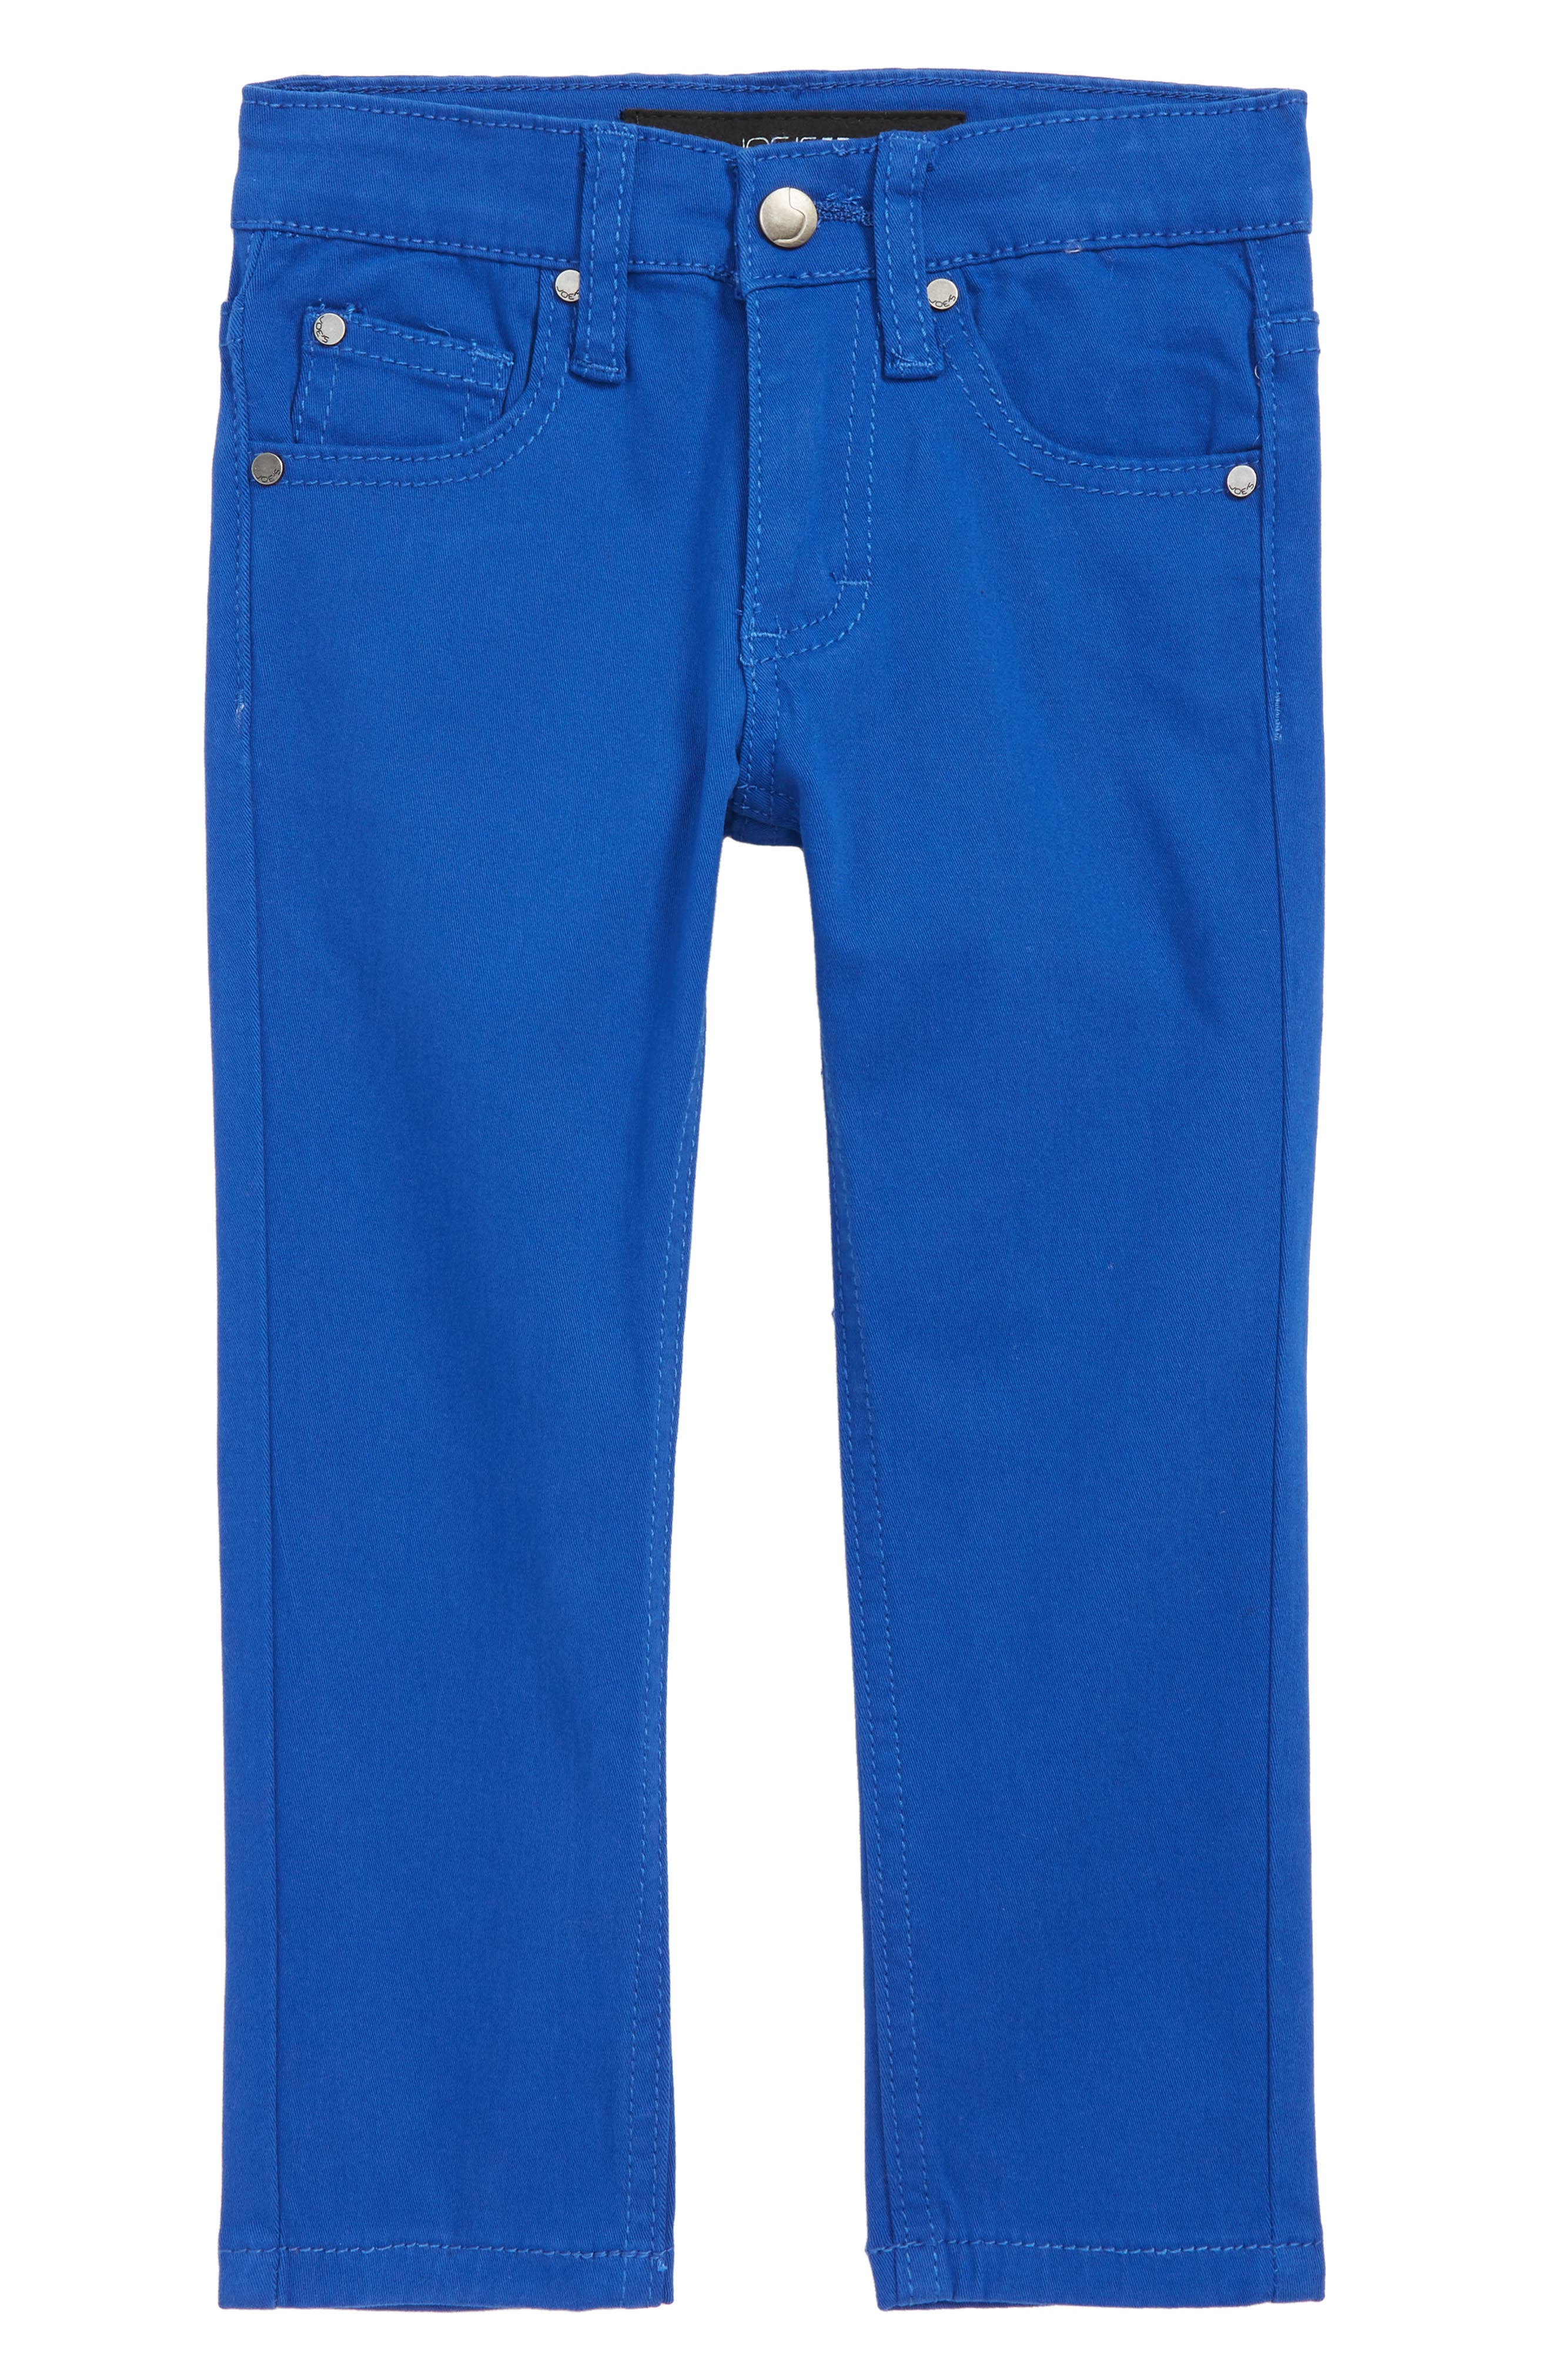 Boys Joes Stretch Twill 5Pocket Pants